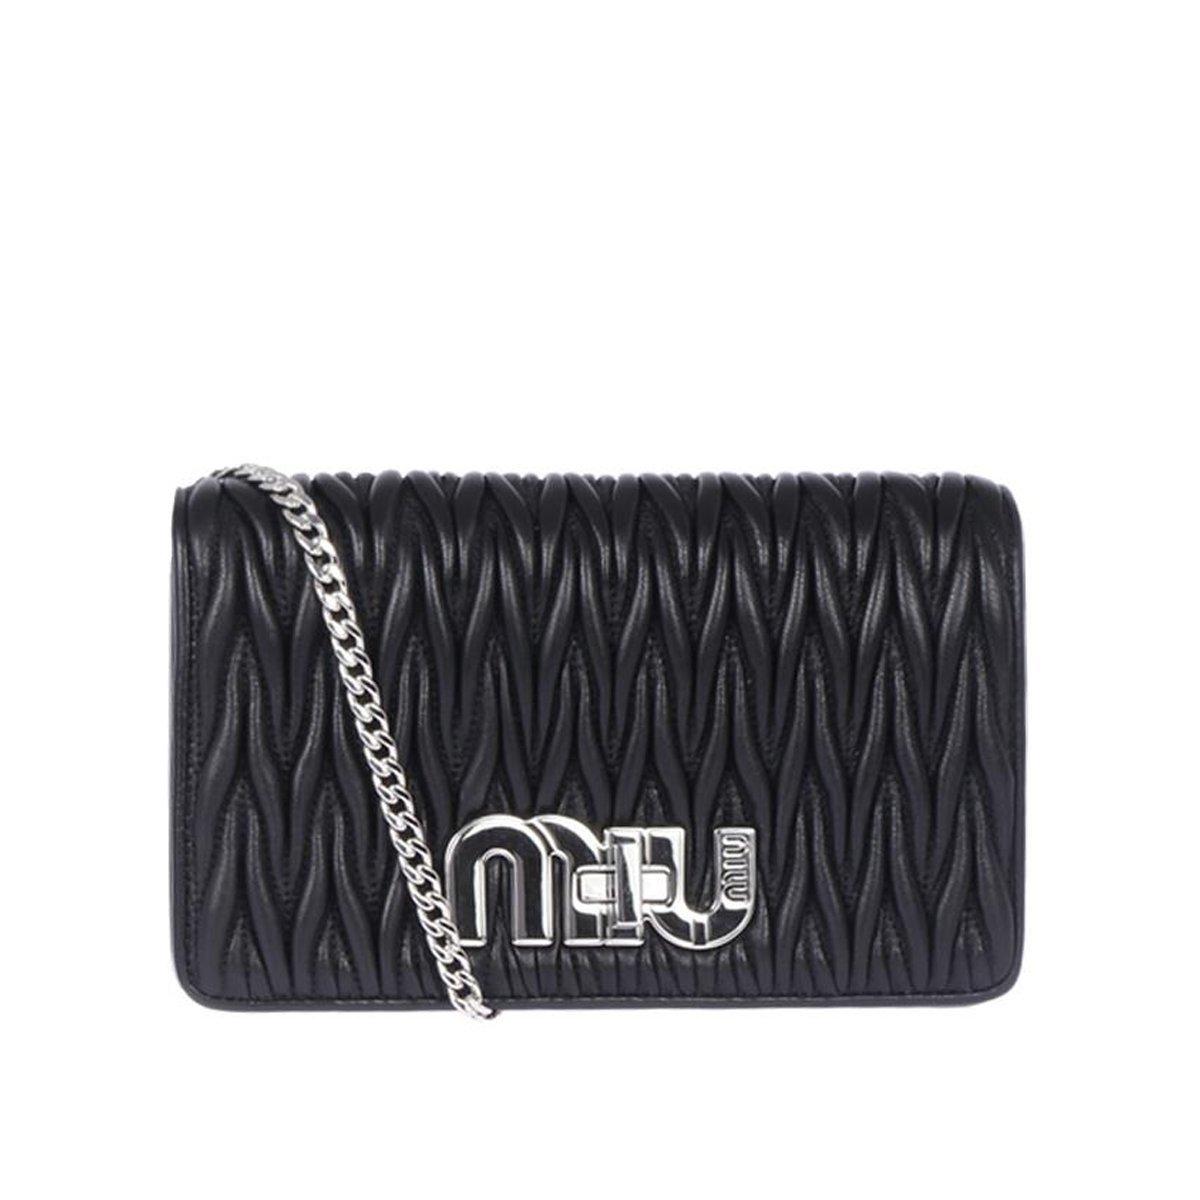 Miu Miu Prada Women s Black Tessuto Nylon Crossbody 5BF069  Prada  Fashion   QueenBee  Designer  Fendi  Balenciaga  Handbags  QueenBeeofBeverlyHills ... 2597047b87145